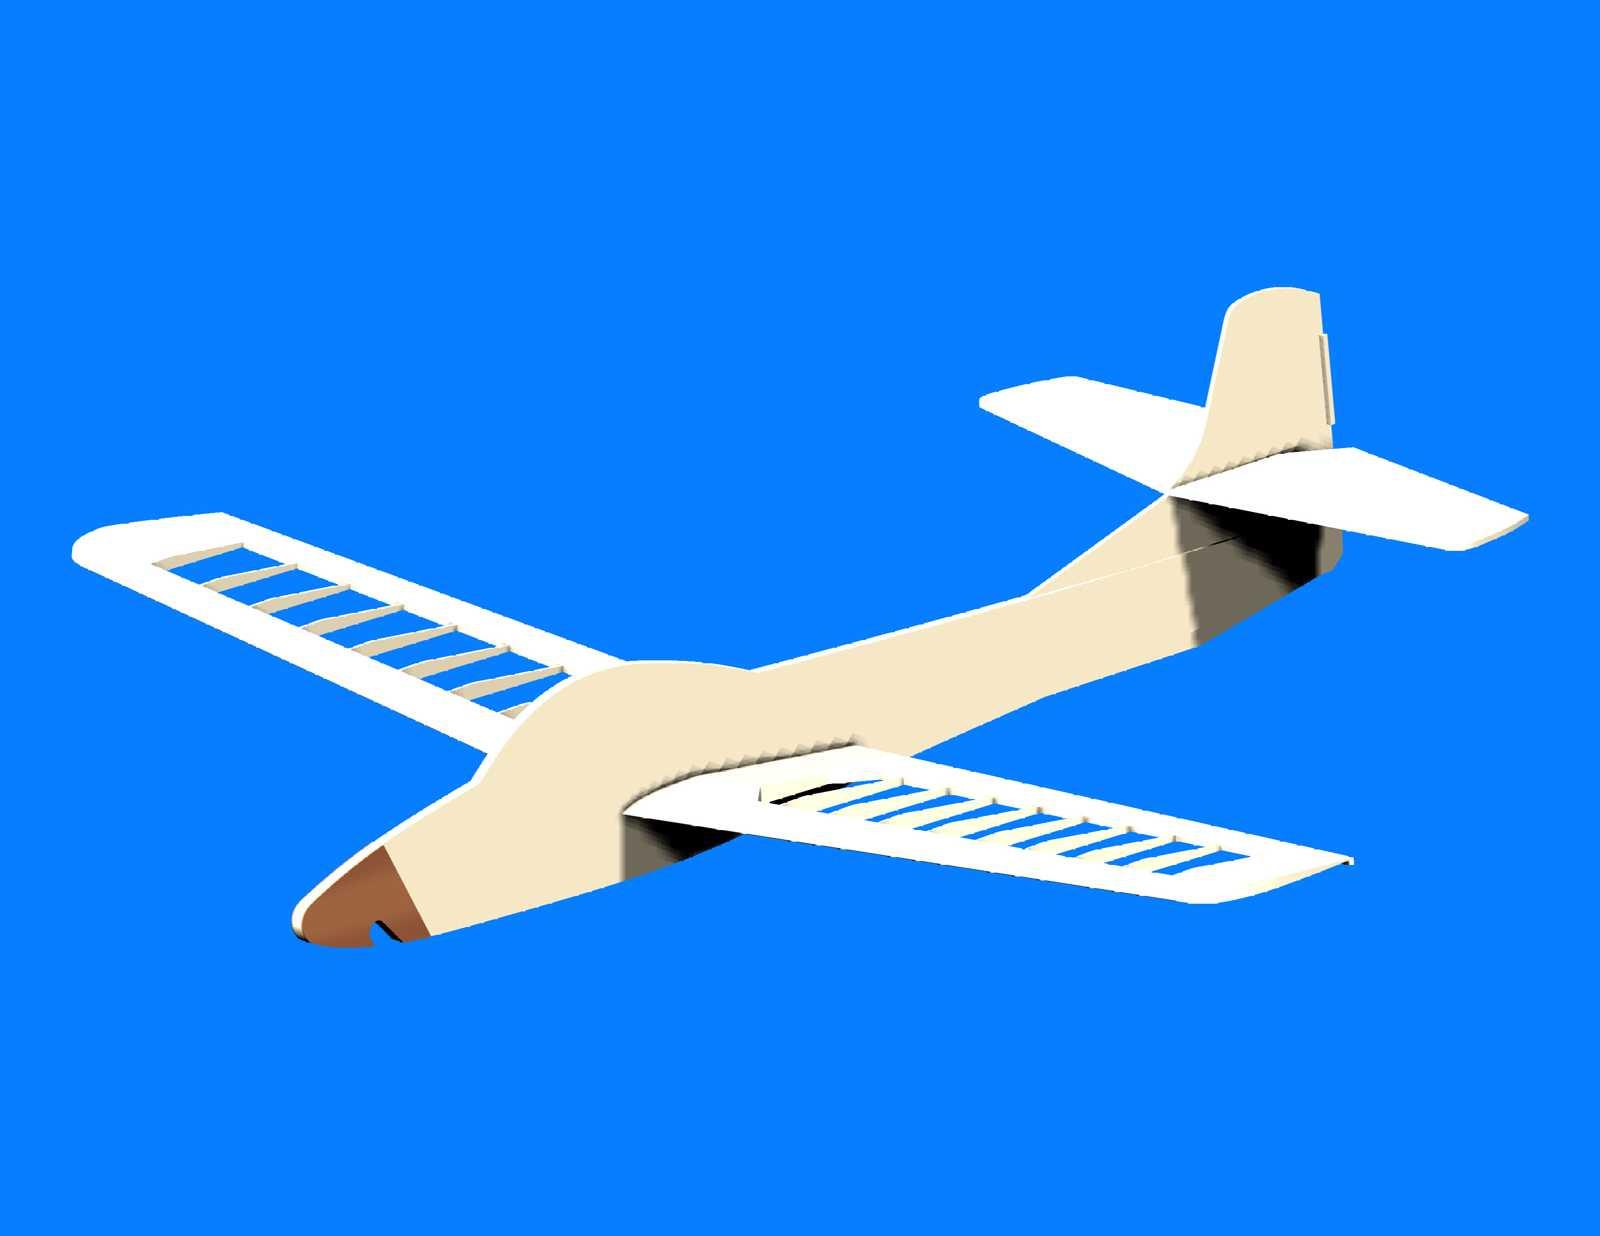 https://0201.nccdn.net/1_2/000/000/0ab/95d/Cessna-T-37-color-rendering-1600x1236.jpg